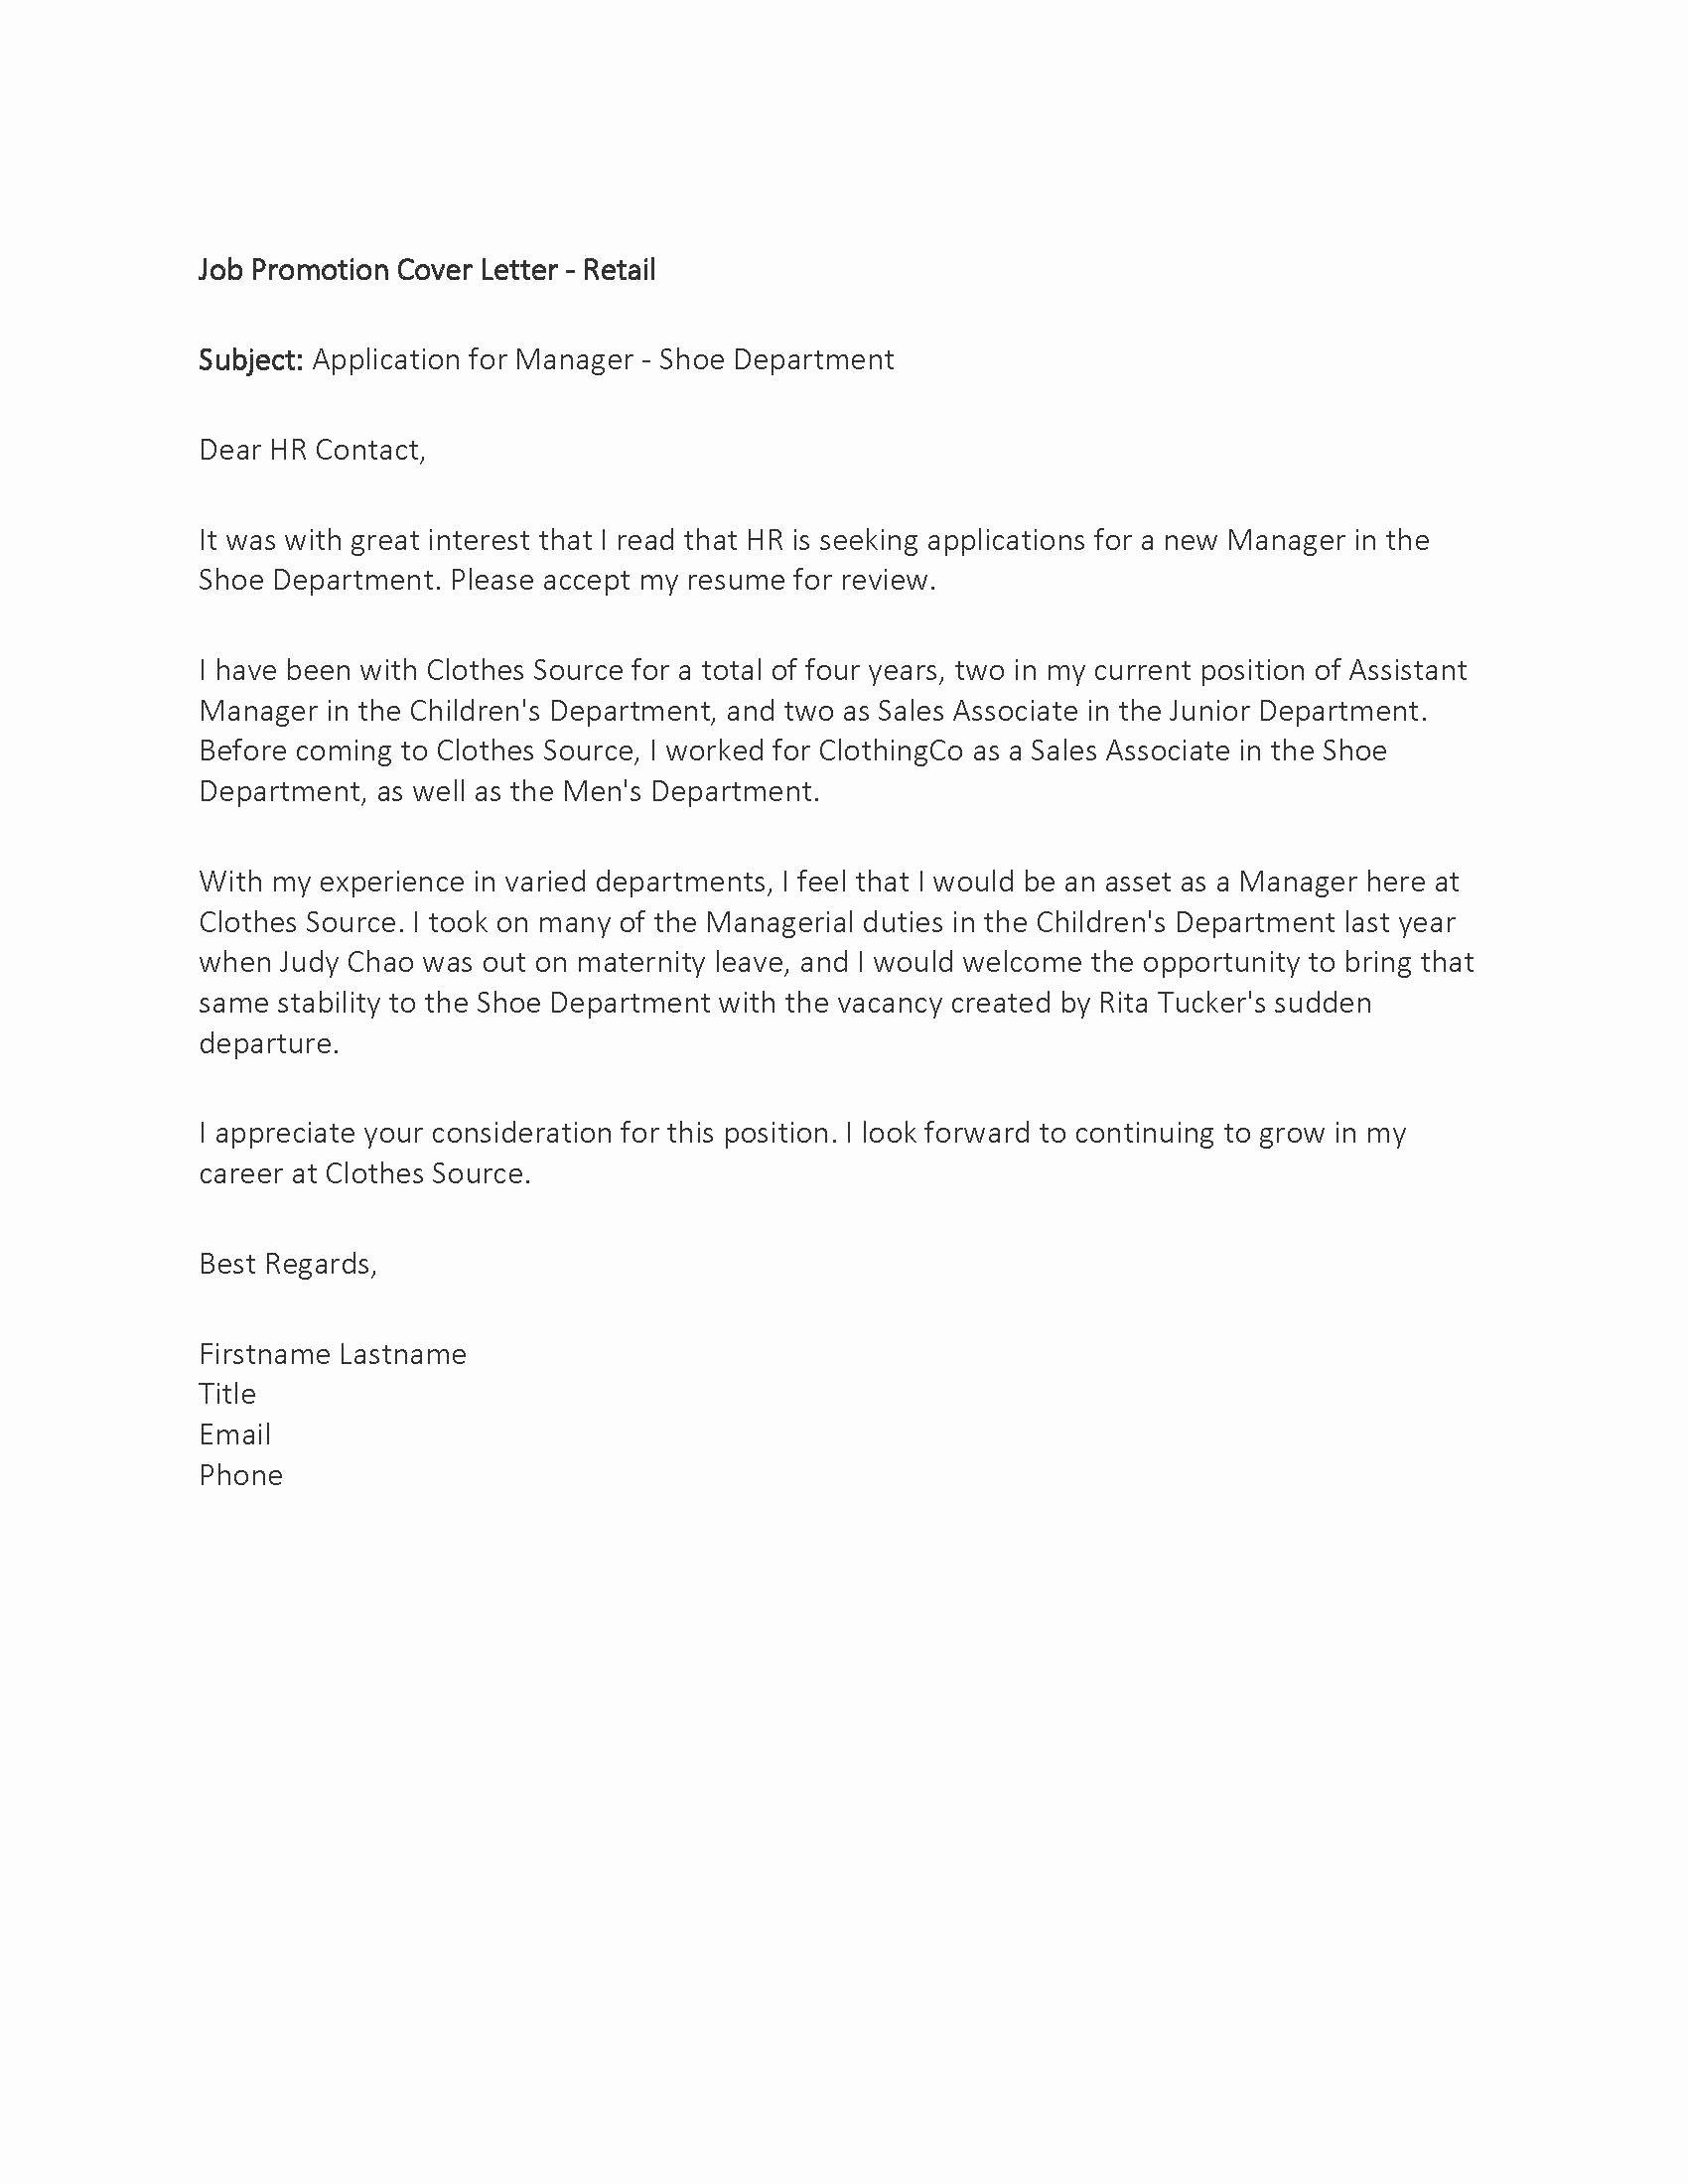 Cover Letter for Promotion Best Of Sample – Job Promotion Cover Letter